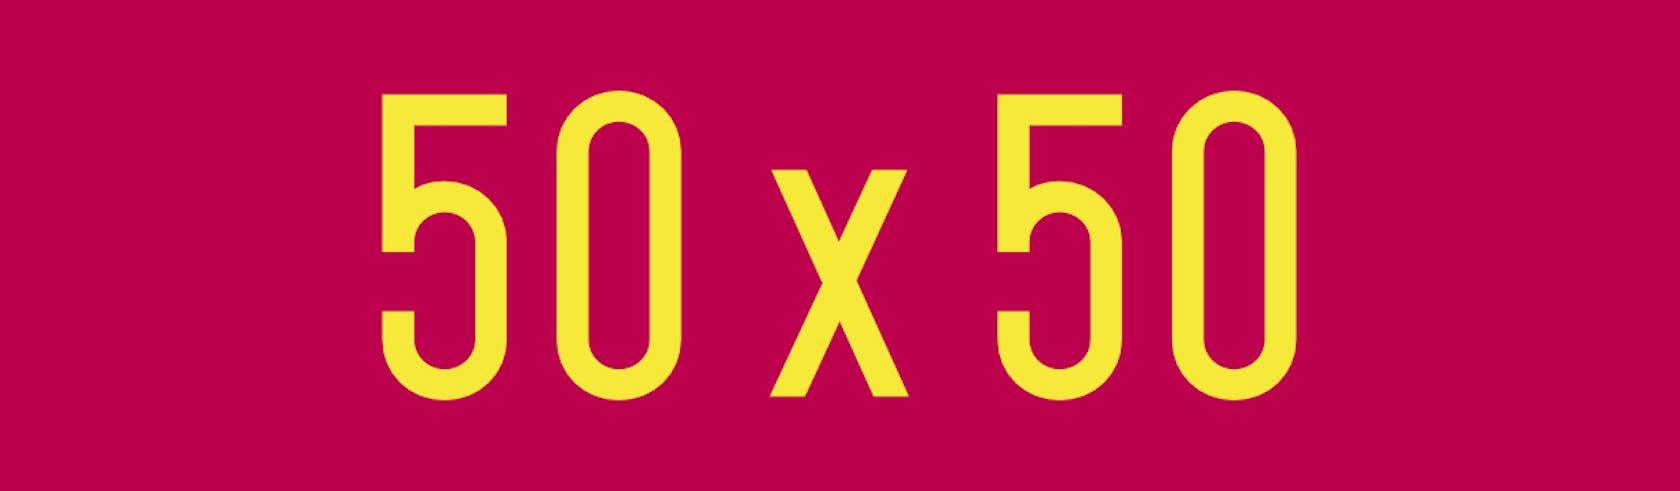 Summer Sale 50x50